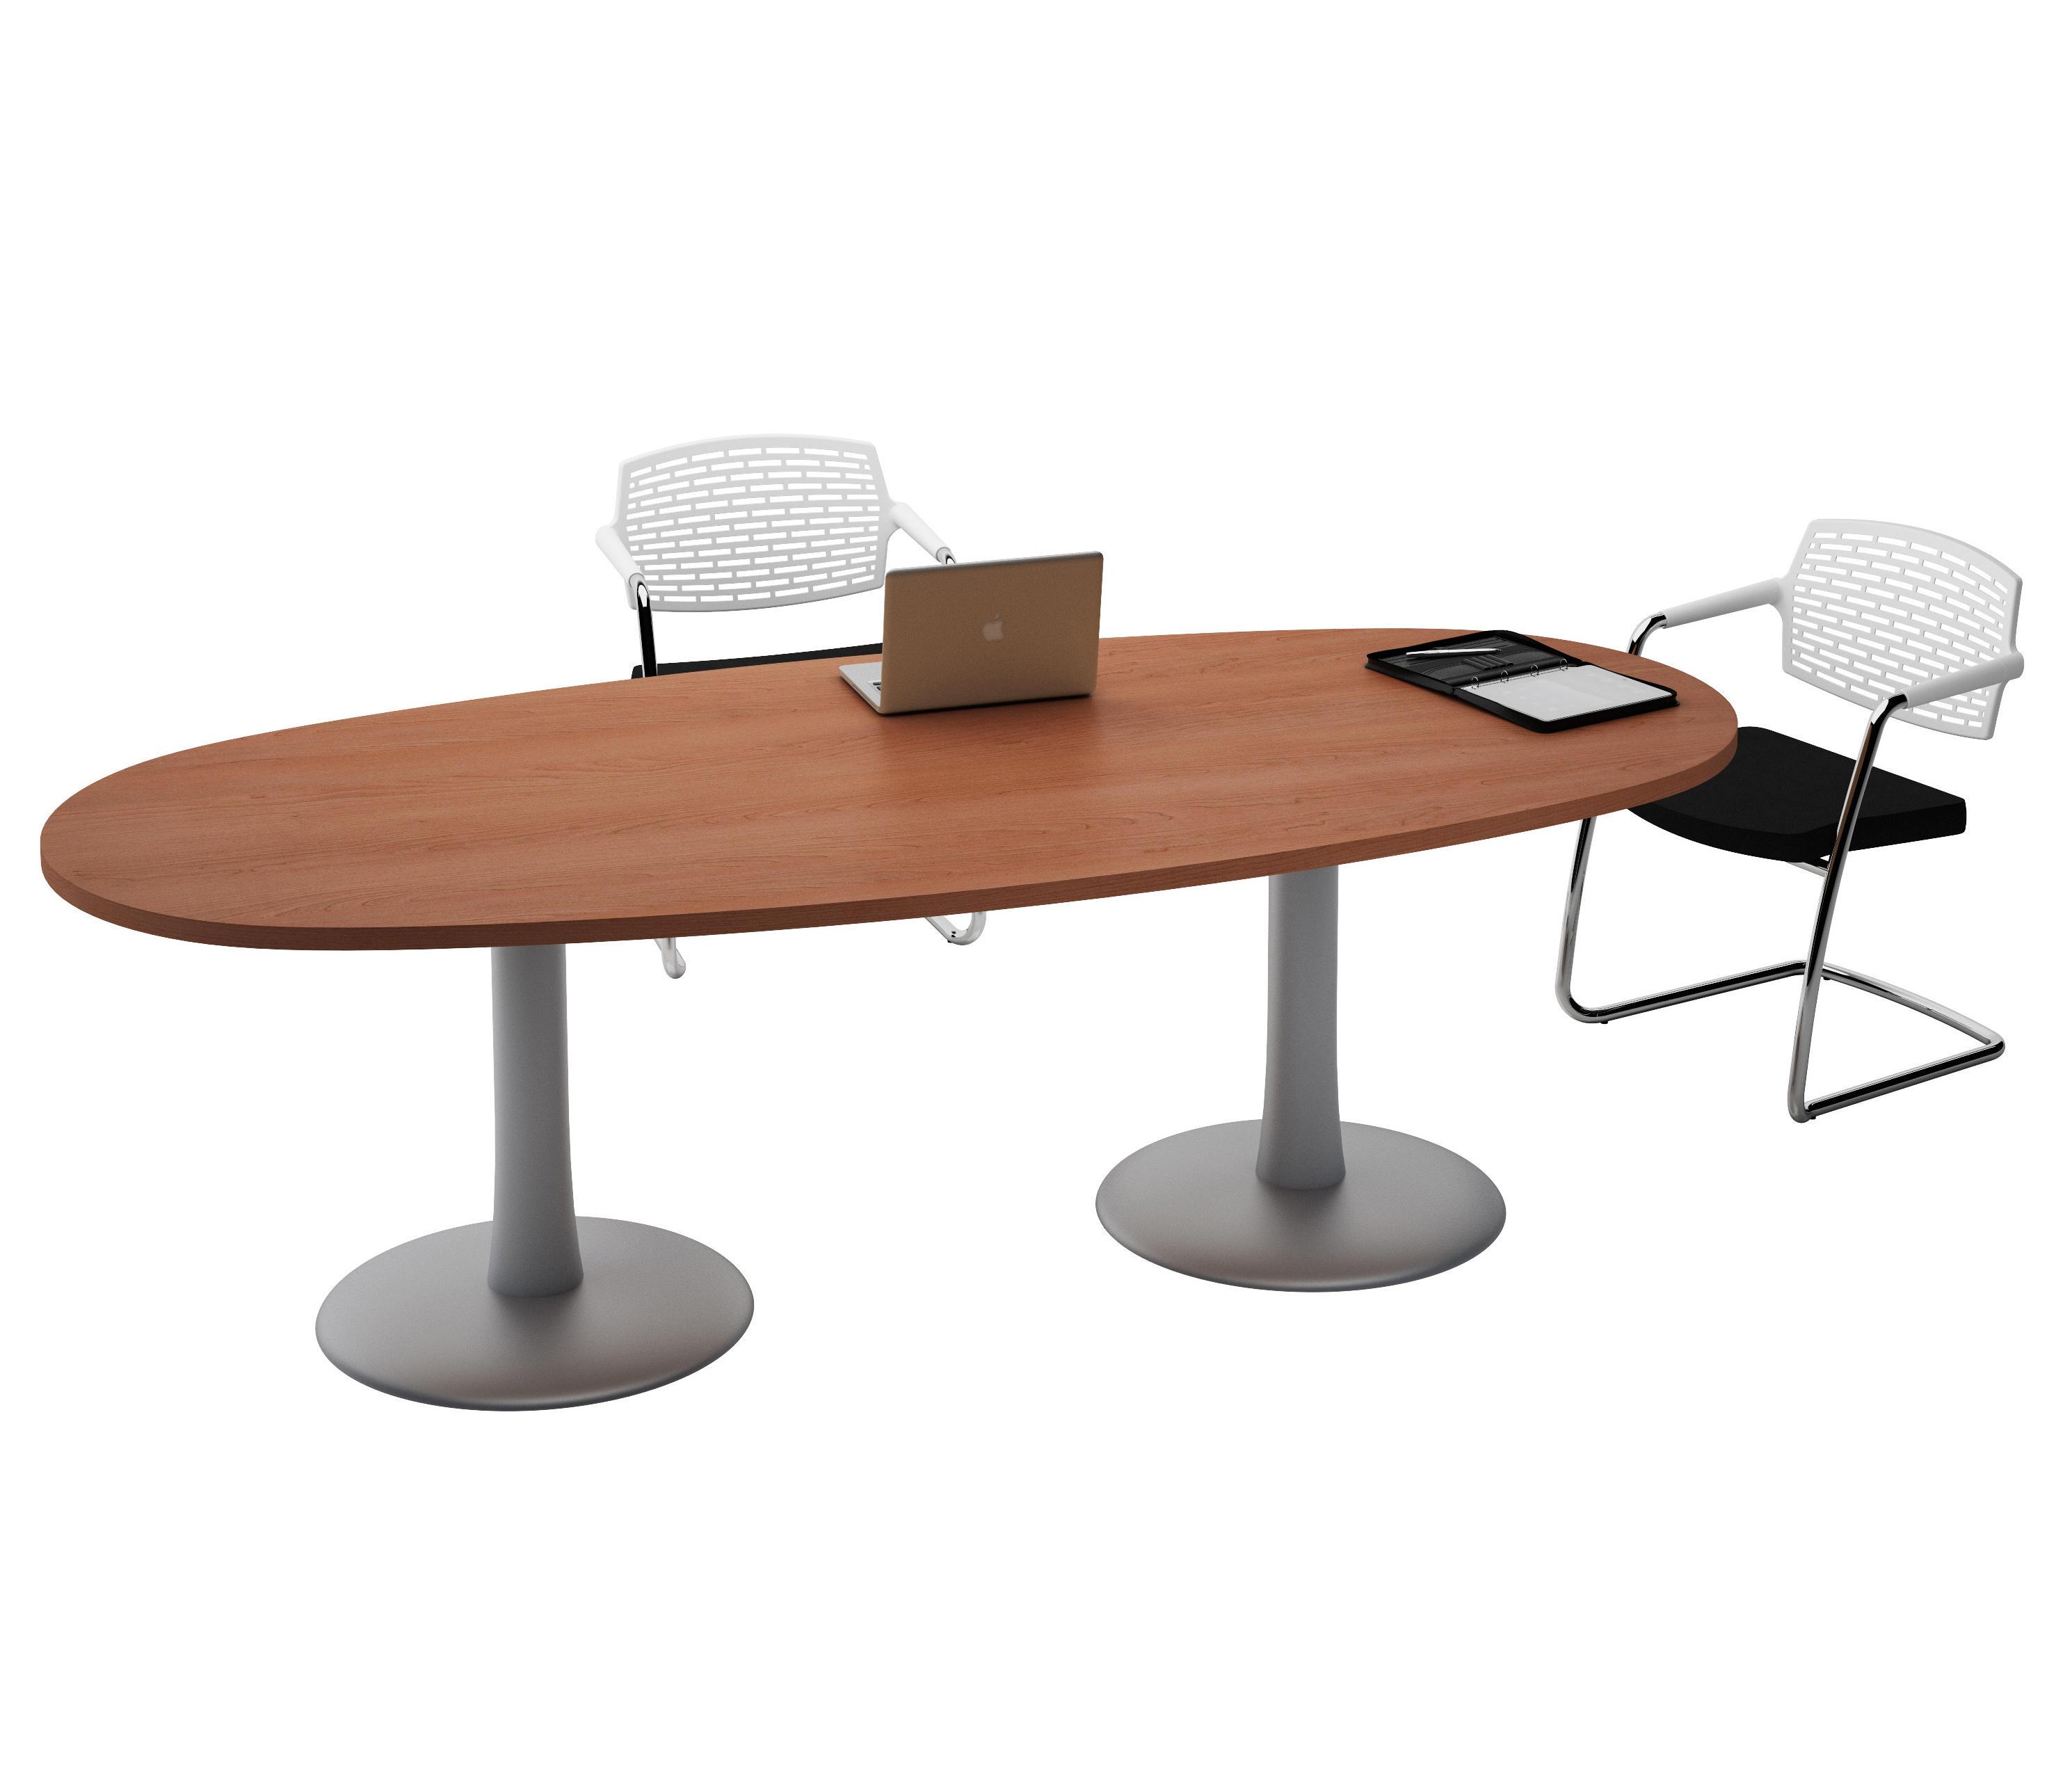 table de conf rence tables collectivit s de the. Black Bedroom Furniture Sets. Home Design Ideas